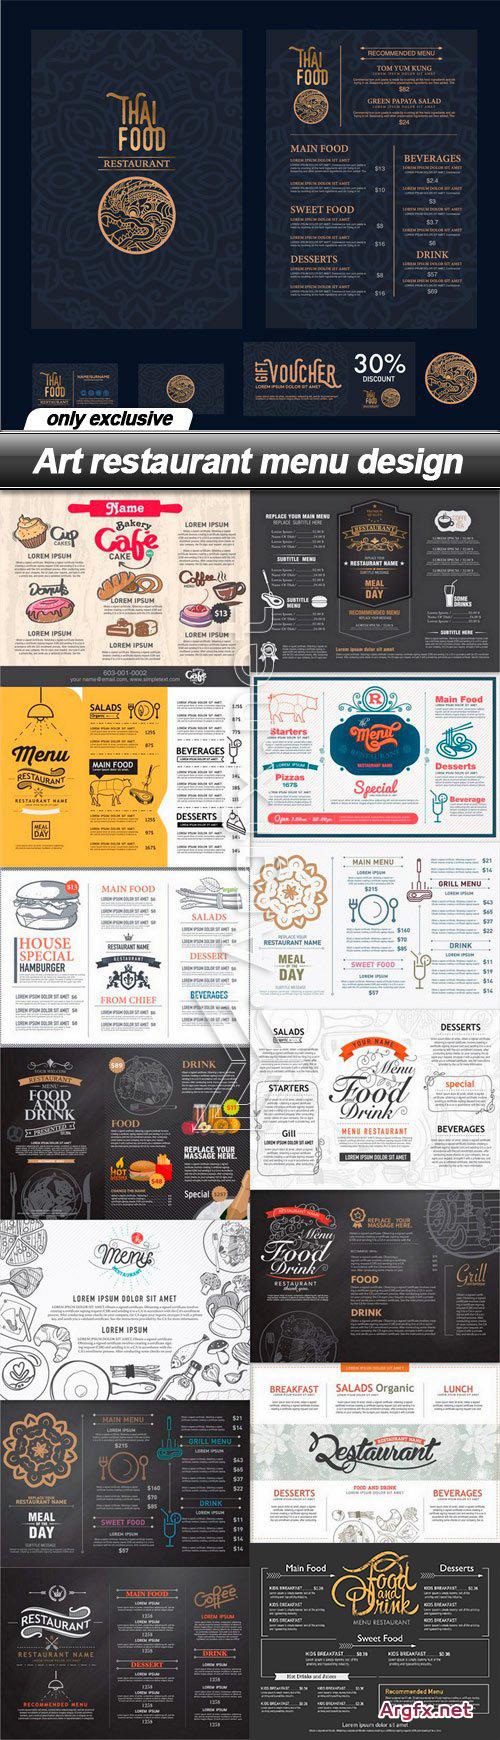 Art Restaurant Menu Design - 15 EPS